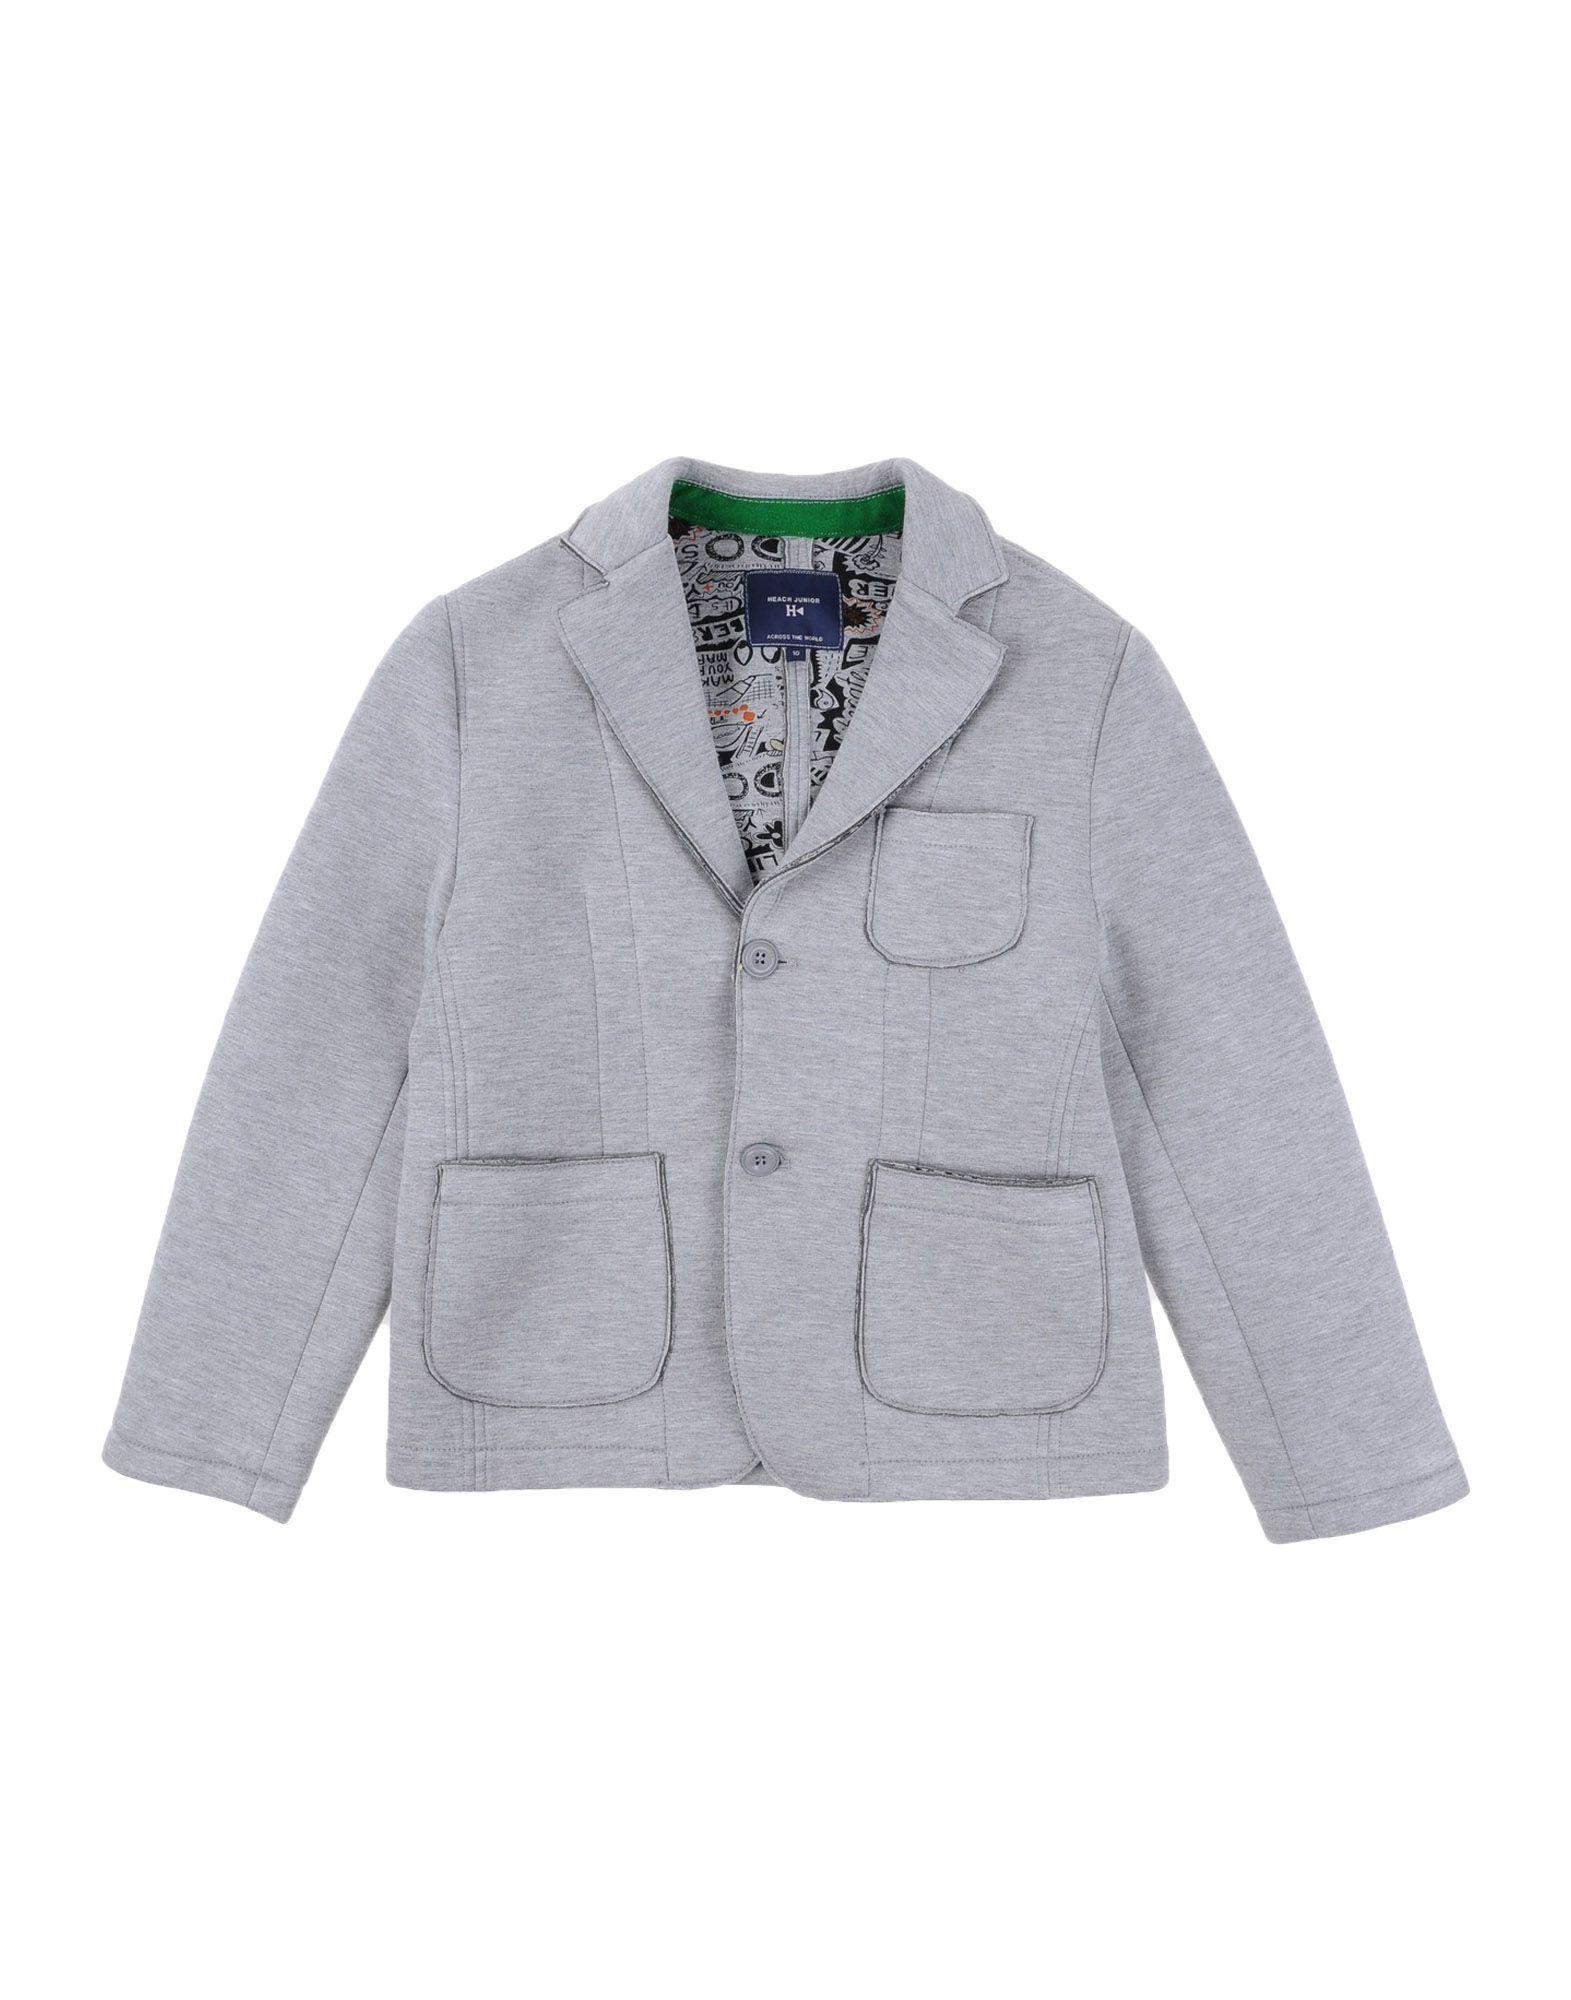 on sale 4c09f d5d21 Silvian Heach Junior - Boys Neoprene Beard Jacket, Grey ...